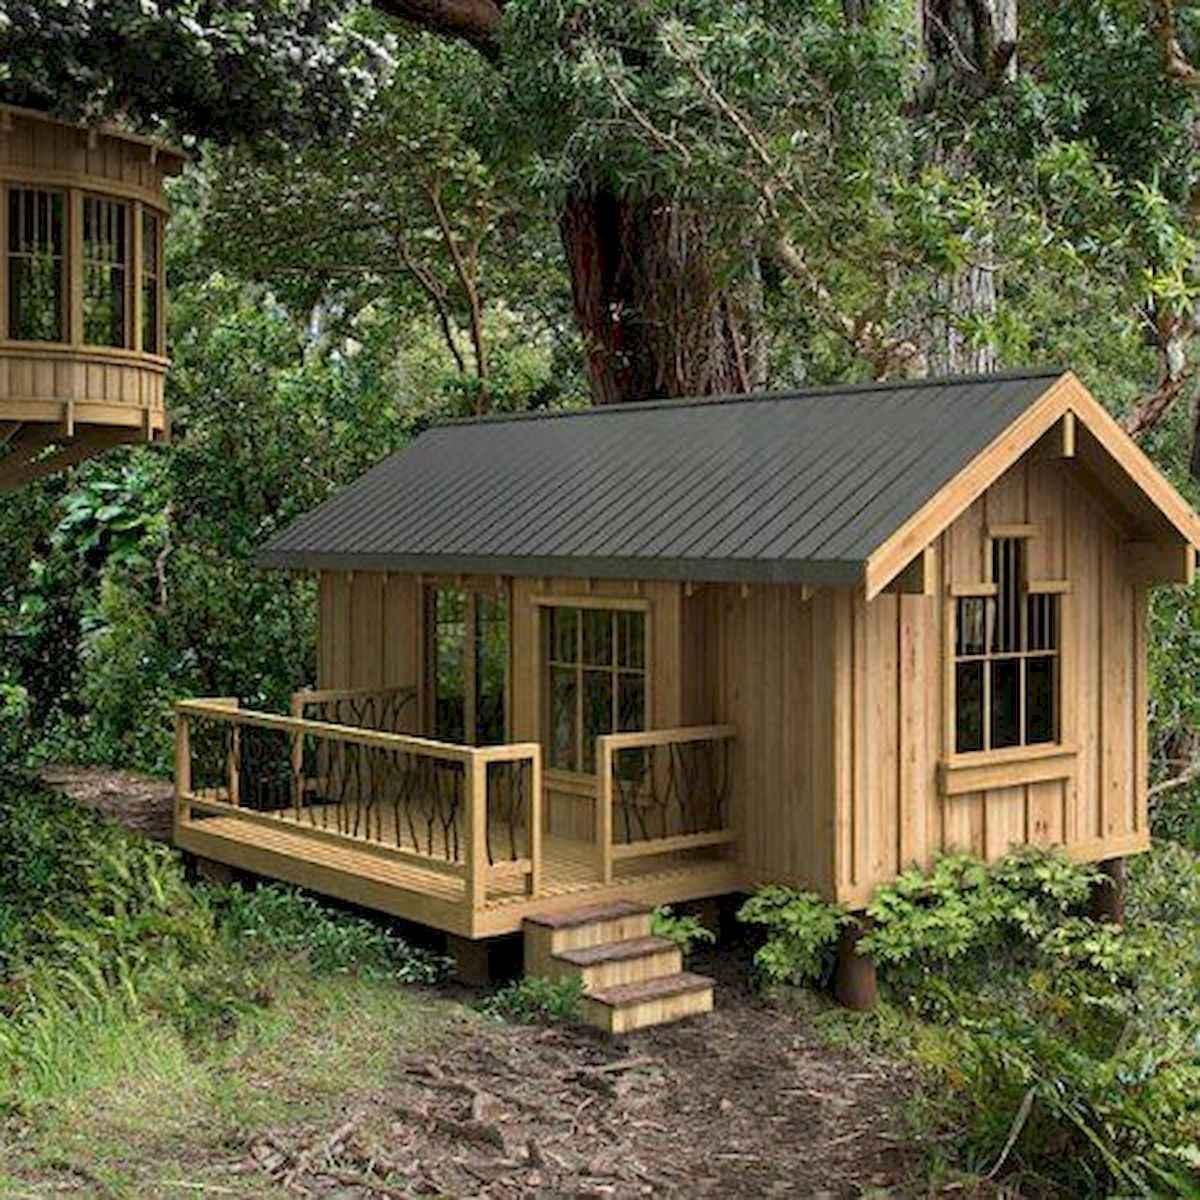 75 Great Log Cabin Homes Plans Design Ideas (20)